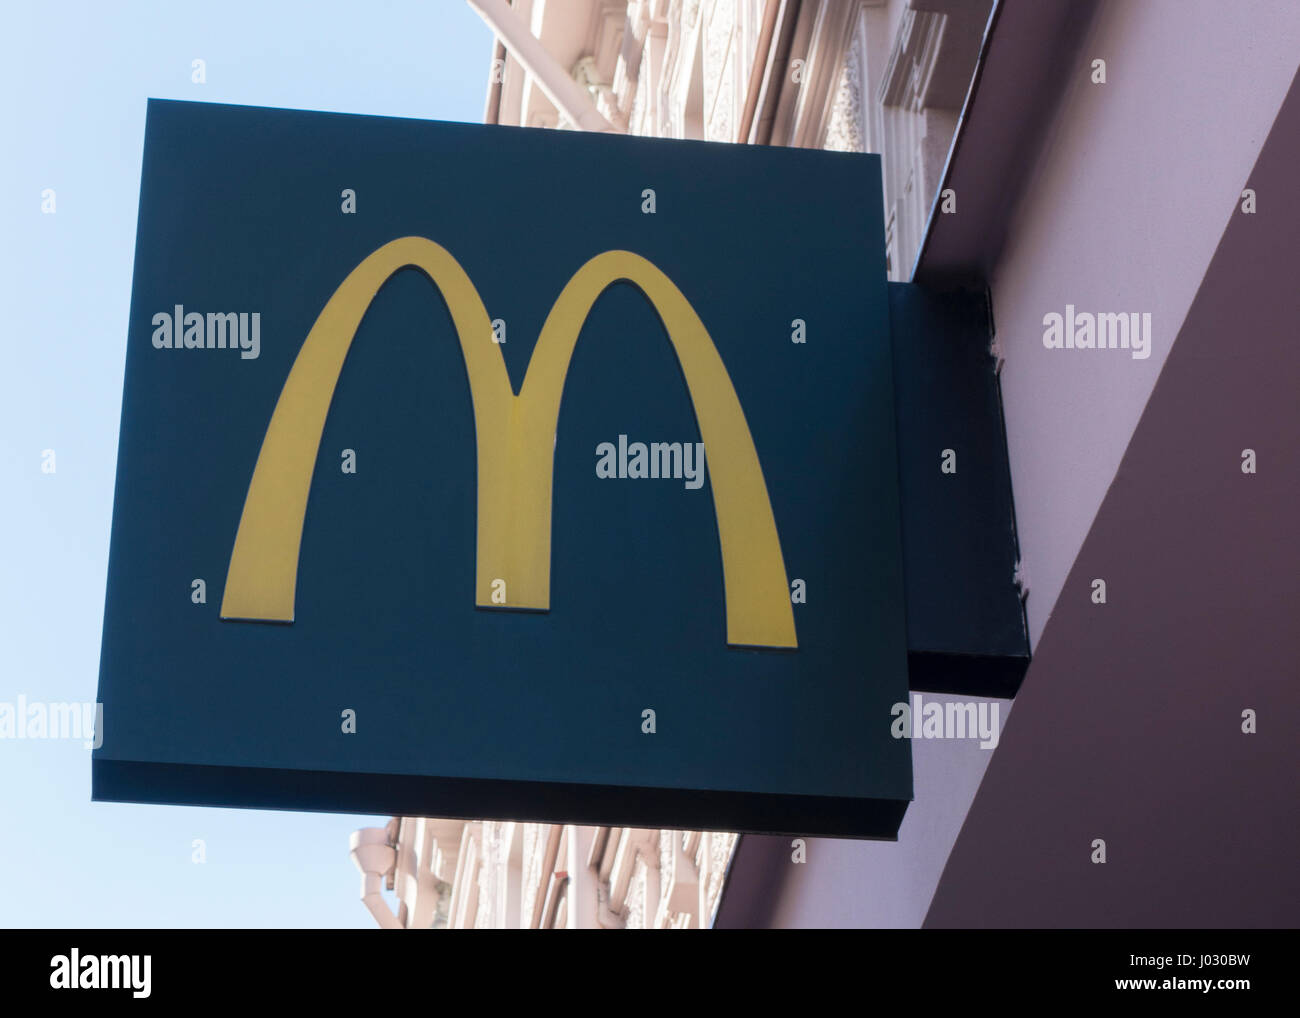 April 7, 2017 - Vilnius: logo and sign for the fast food restaurant 'Mc Donalds', Vilnius, Lithuania - Stock Image